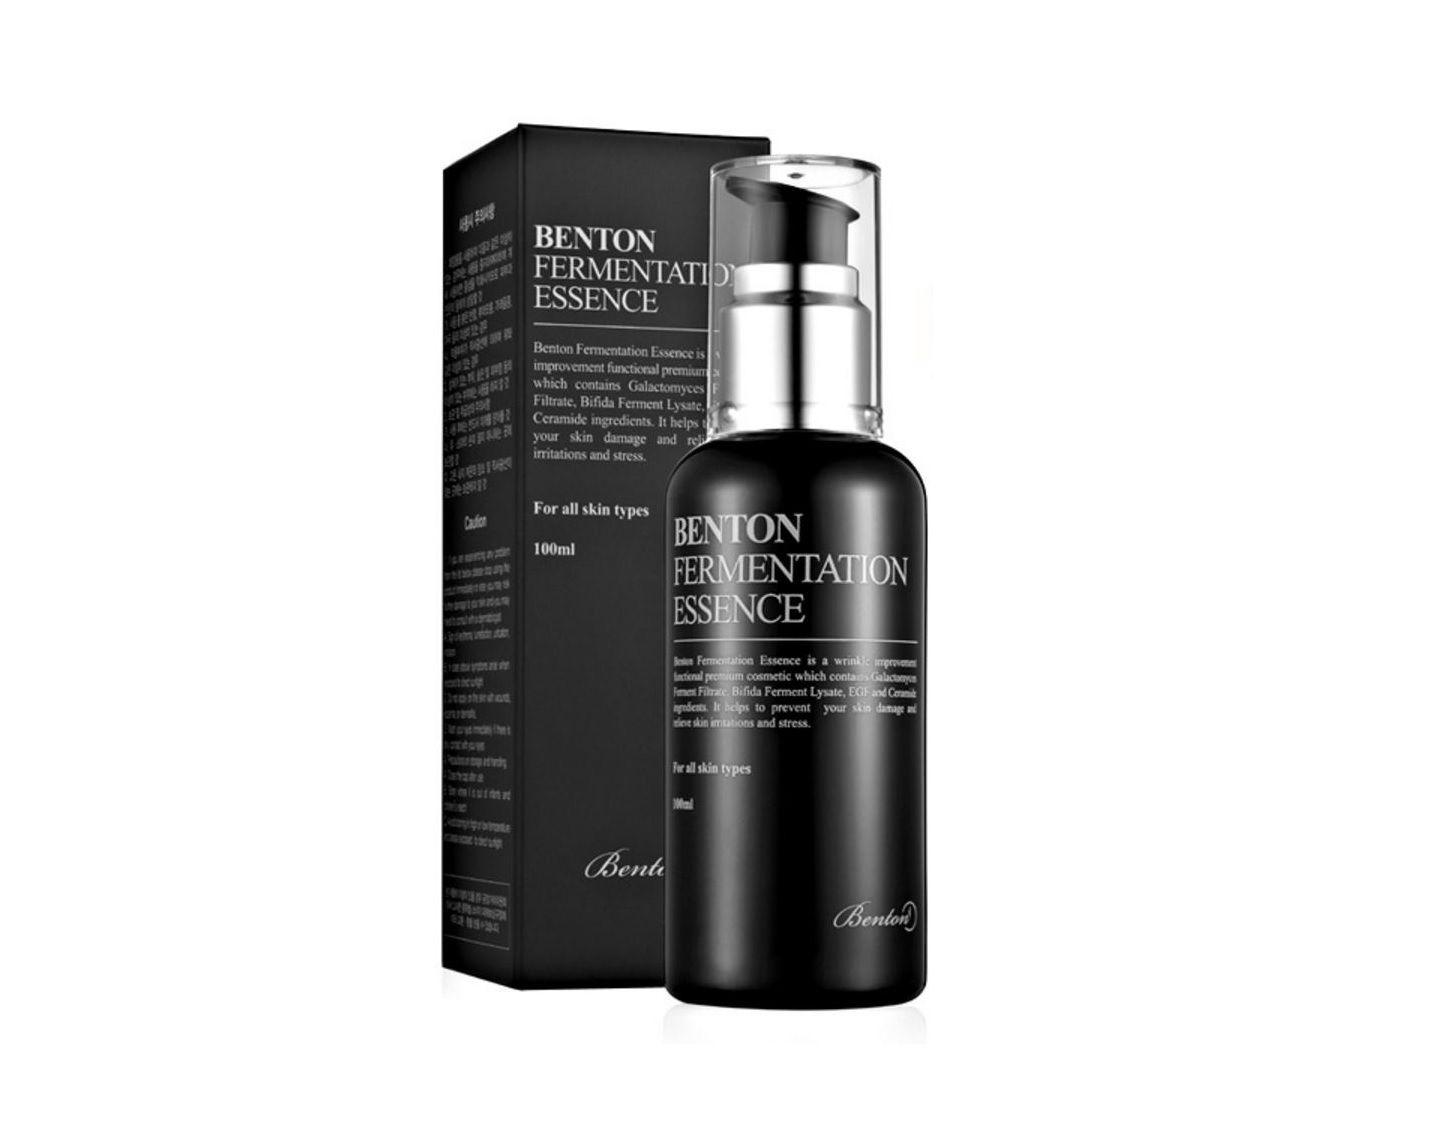 BENTON Fermentation Essence 100ml Wrinkle Improvement Korea Cosmetic  in essence 100ml